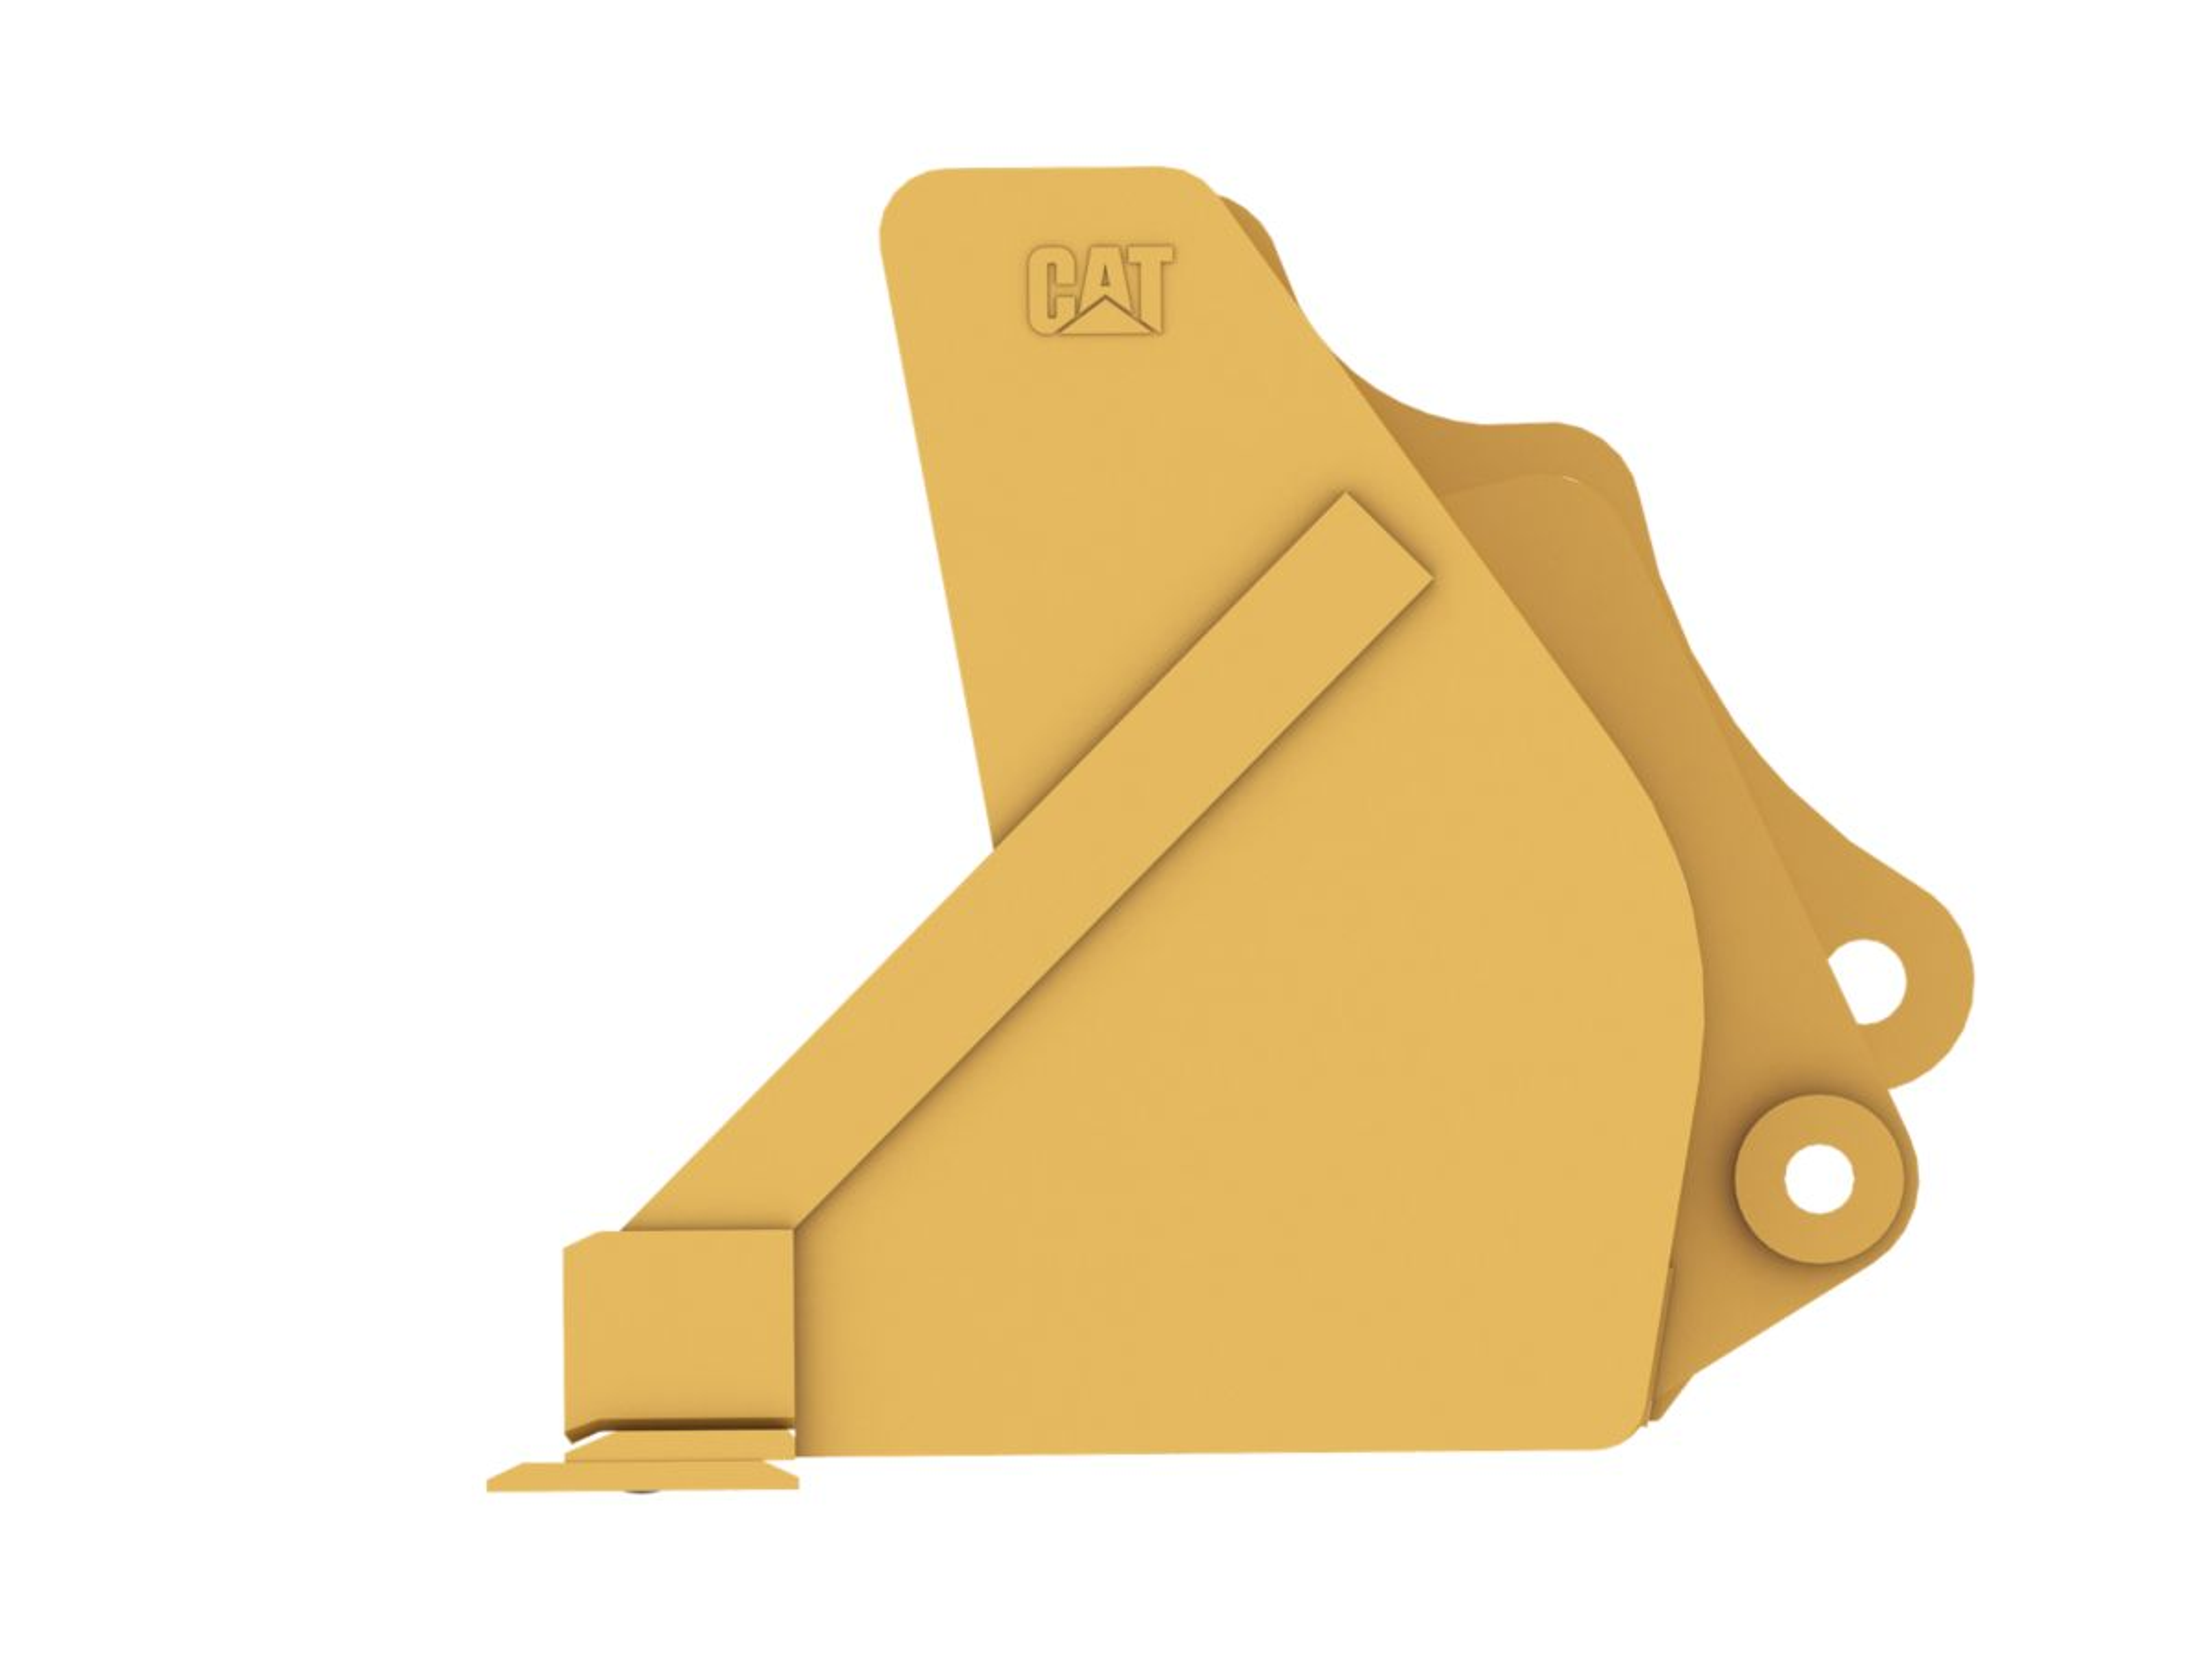 Gallery 1.0 m3 (1.3 yd3), Pin On, Bolt-On Cutting Edge